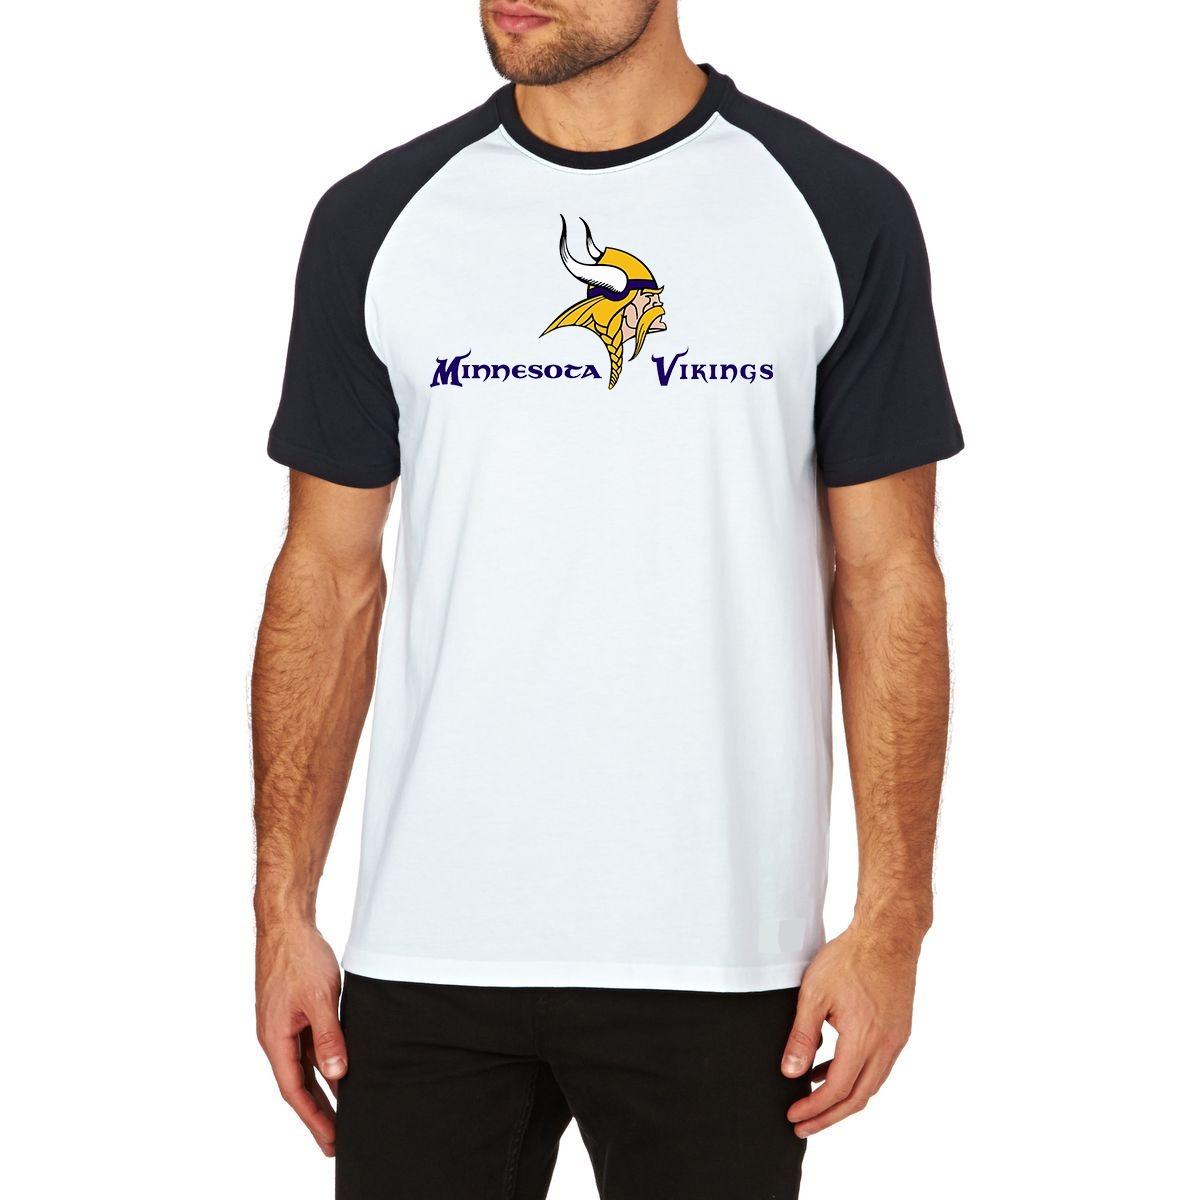 0c96a319d camiseta minnesota vikings raglan futebol americano nfl m01. Carregando zoom .